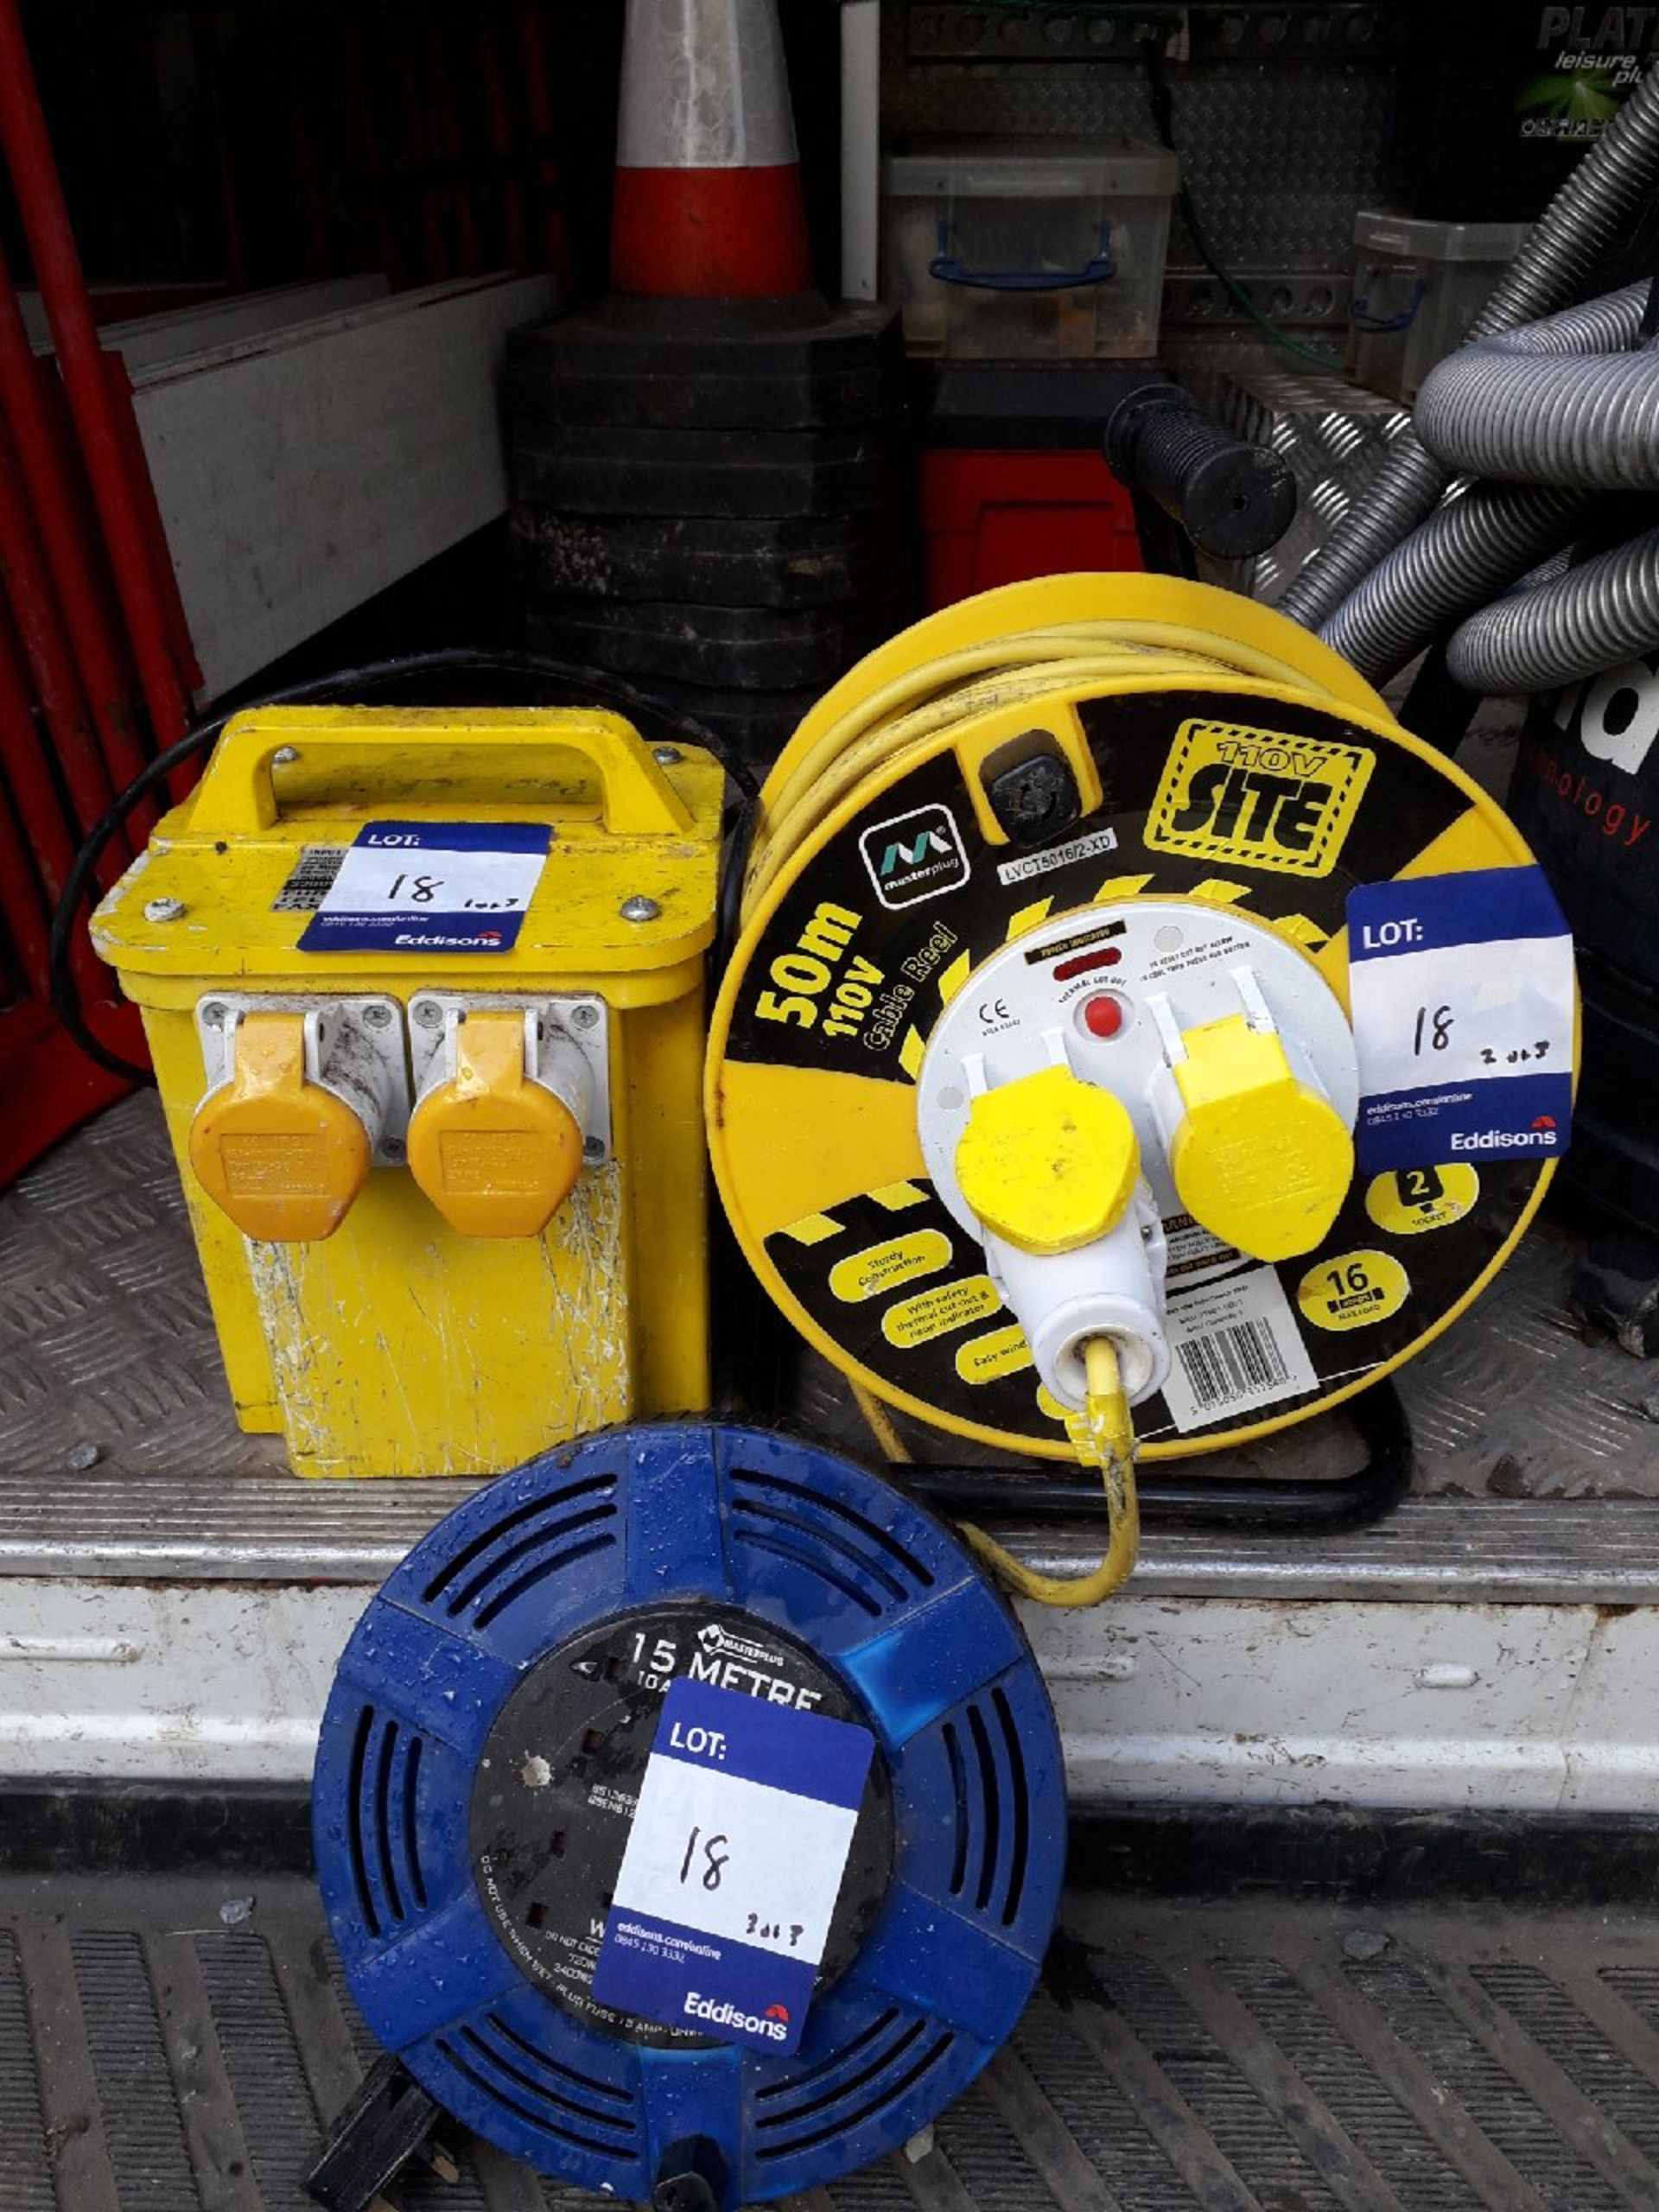 Lot 18 - 1 x Transformer double socket 240v to 110v, 1 x 2 socket 50m cable reel 110v, 1 x 15m cable reel (